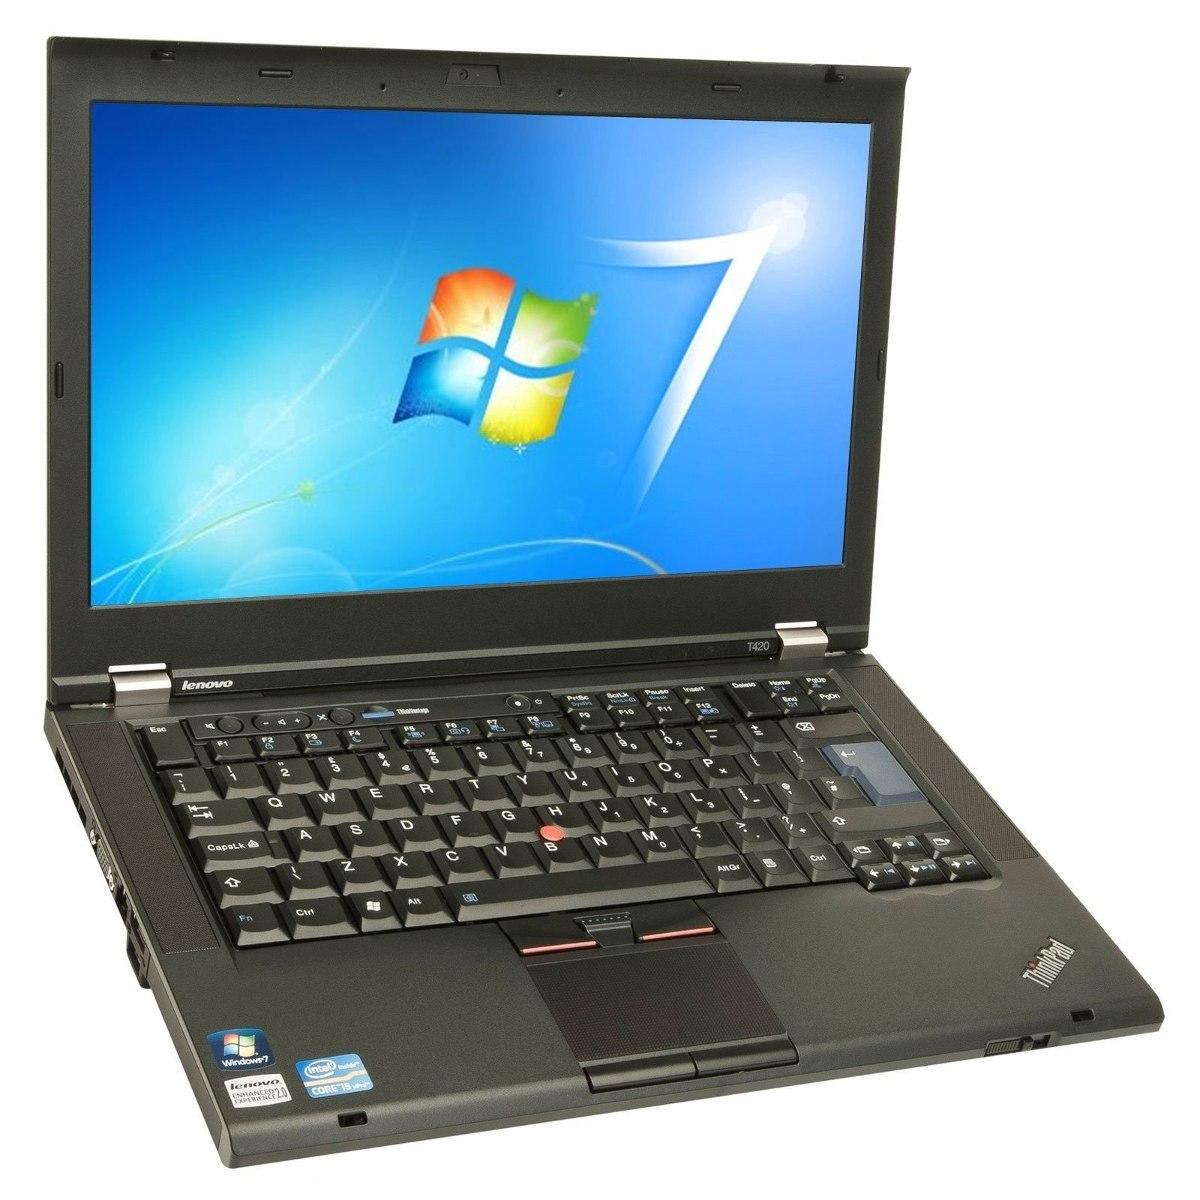 Notebook Lenovo Thinkpad T420 Core I5 4gb Ram Hd 320gb R